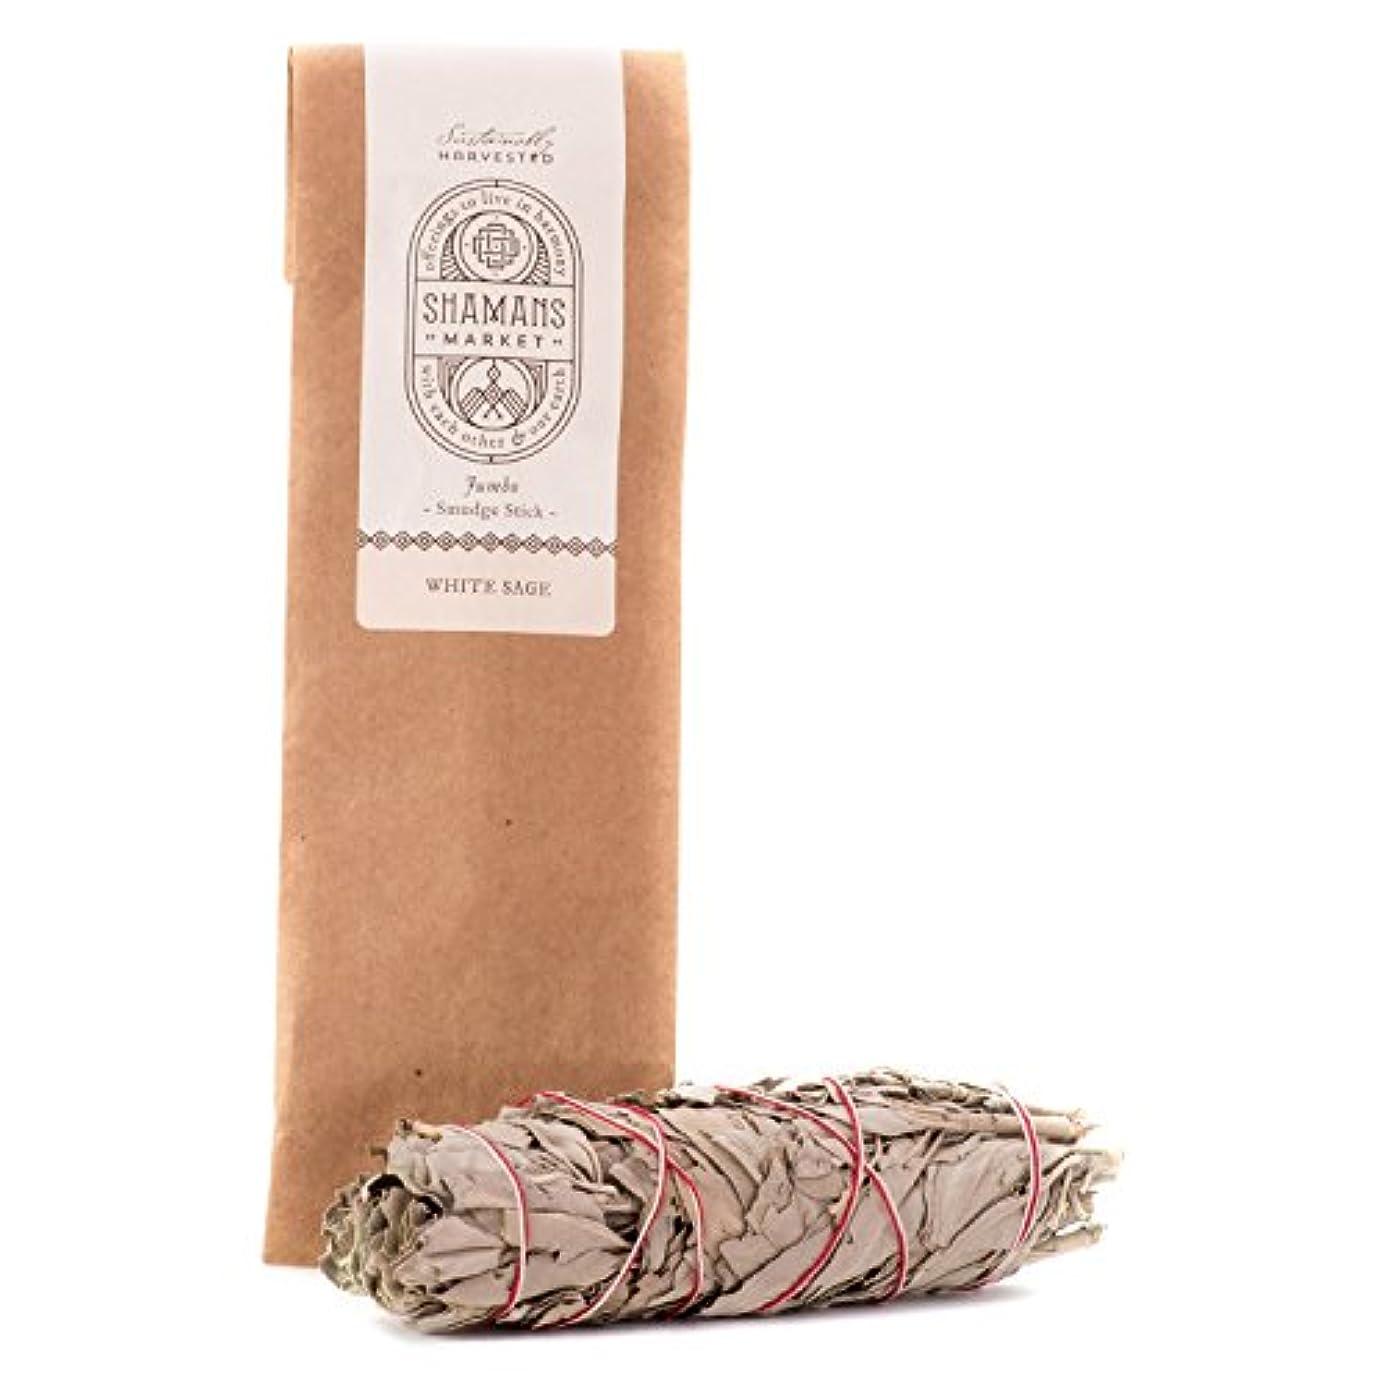 White Sage Jumbo Smudge Stick - 8-9 in. by Shamans Market